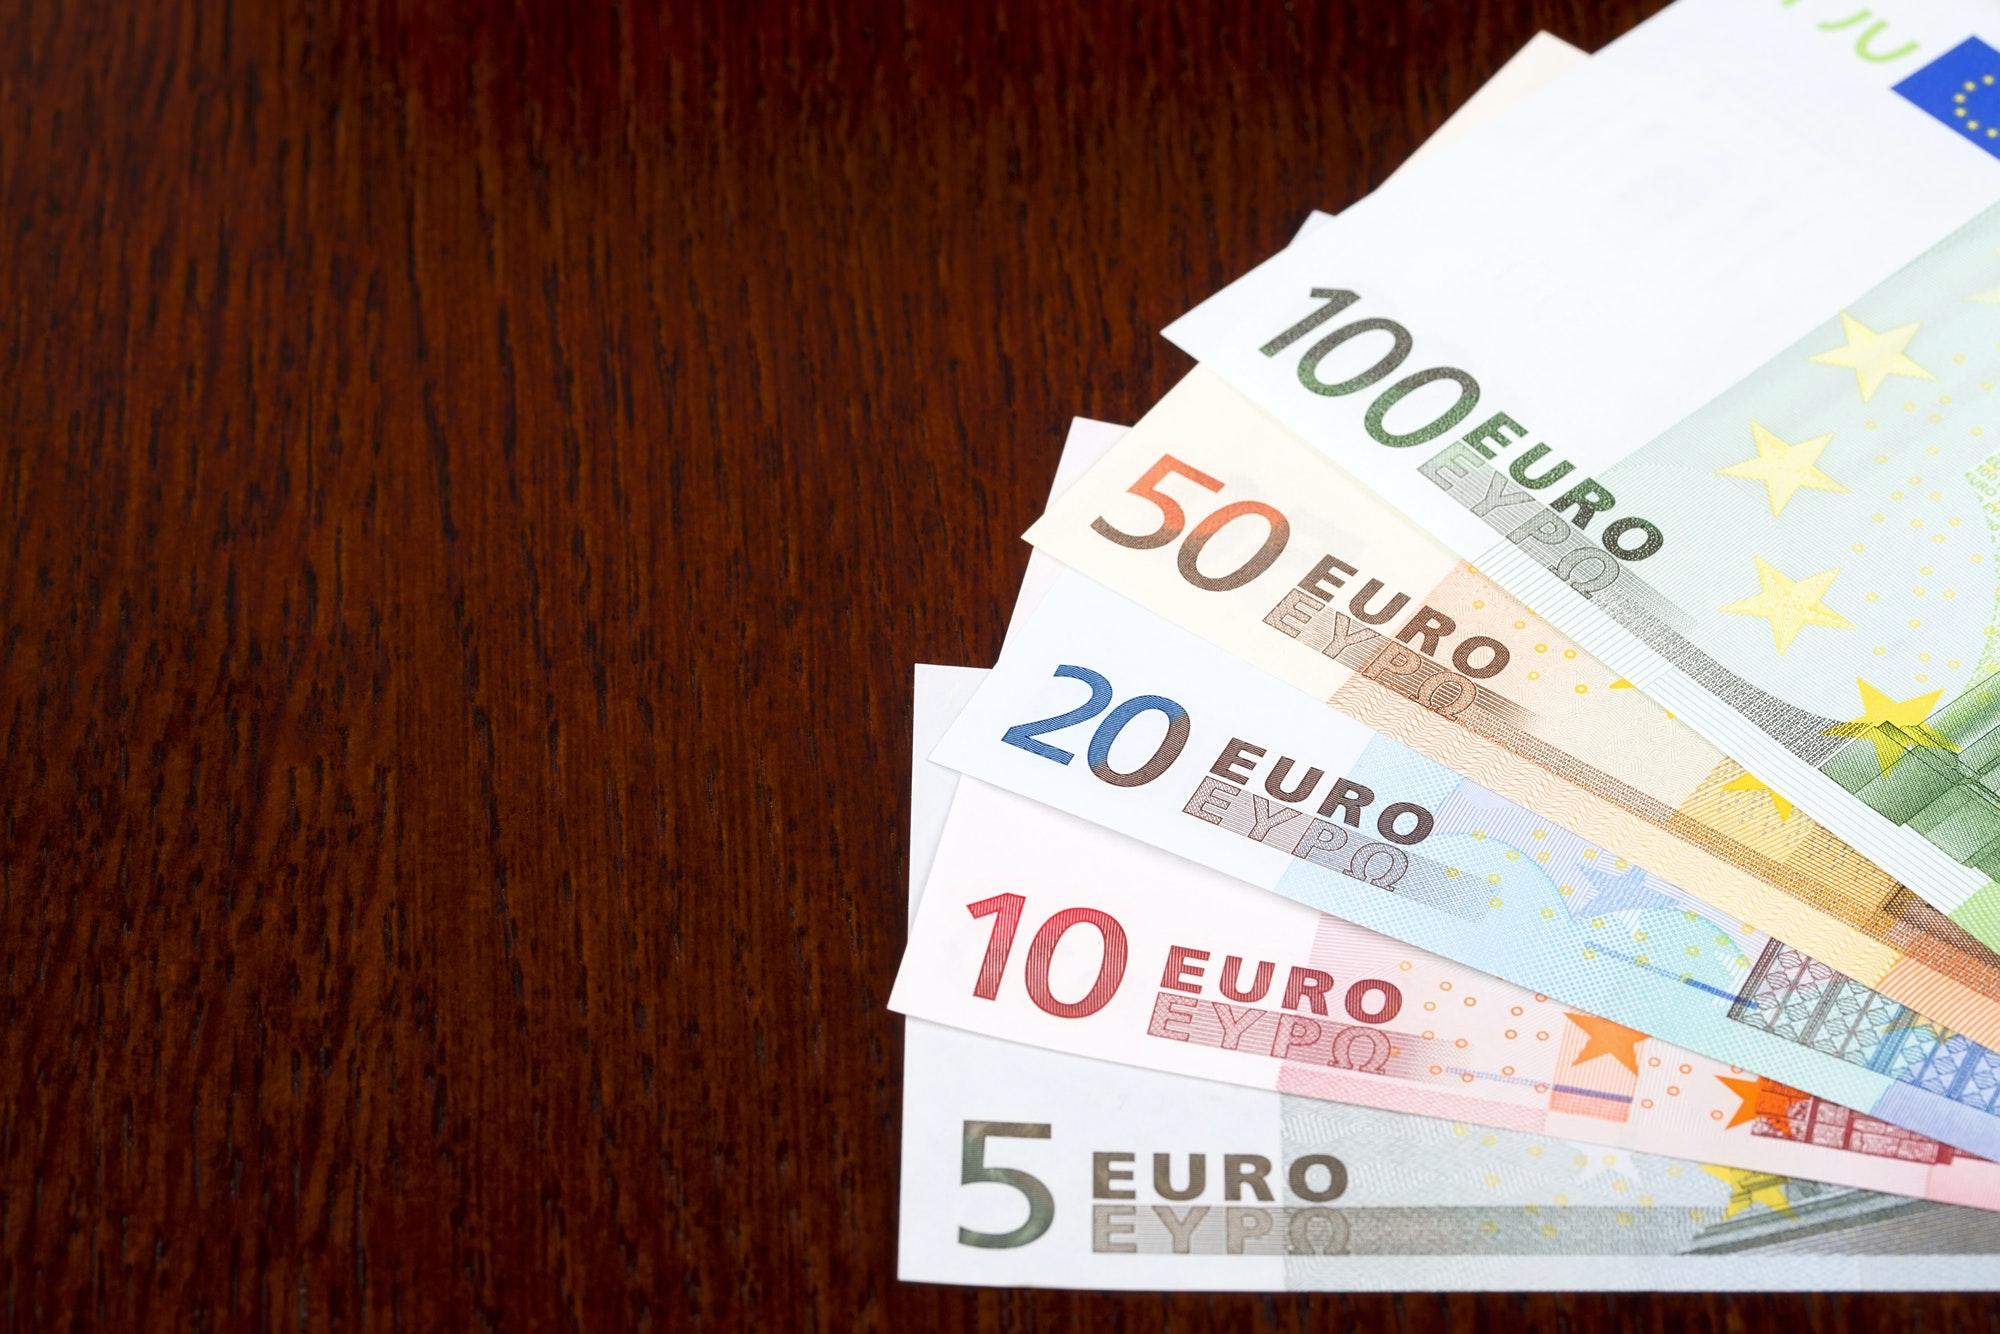 European money on a wooden background